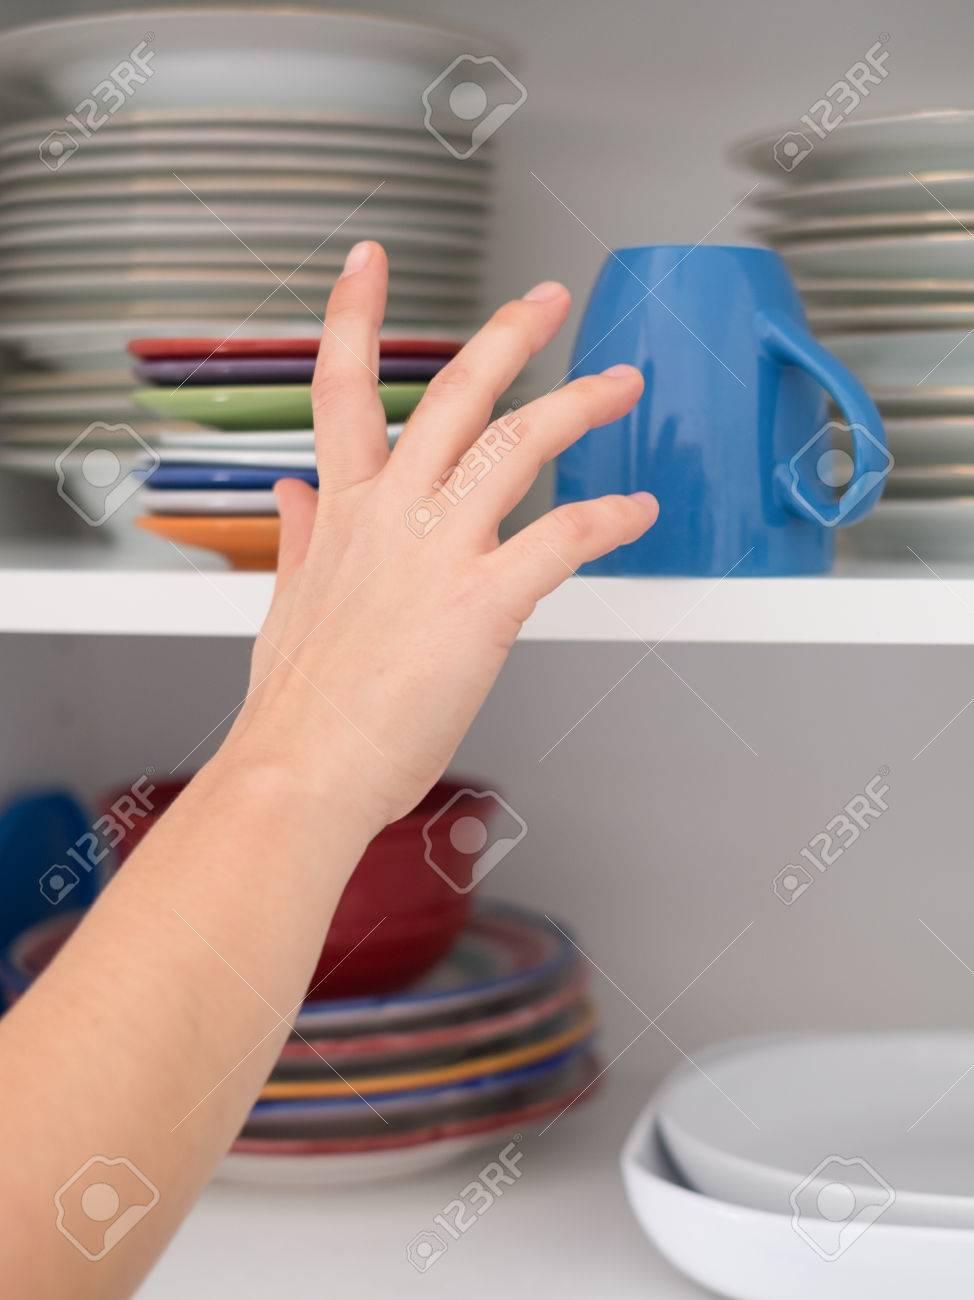 Femme Prendre Tasse Meuble Cuisine Petit Dejeuner